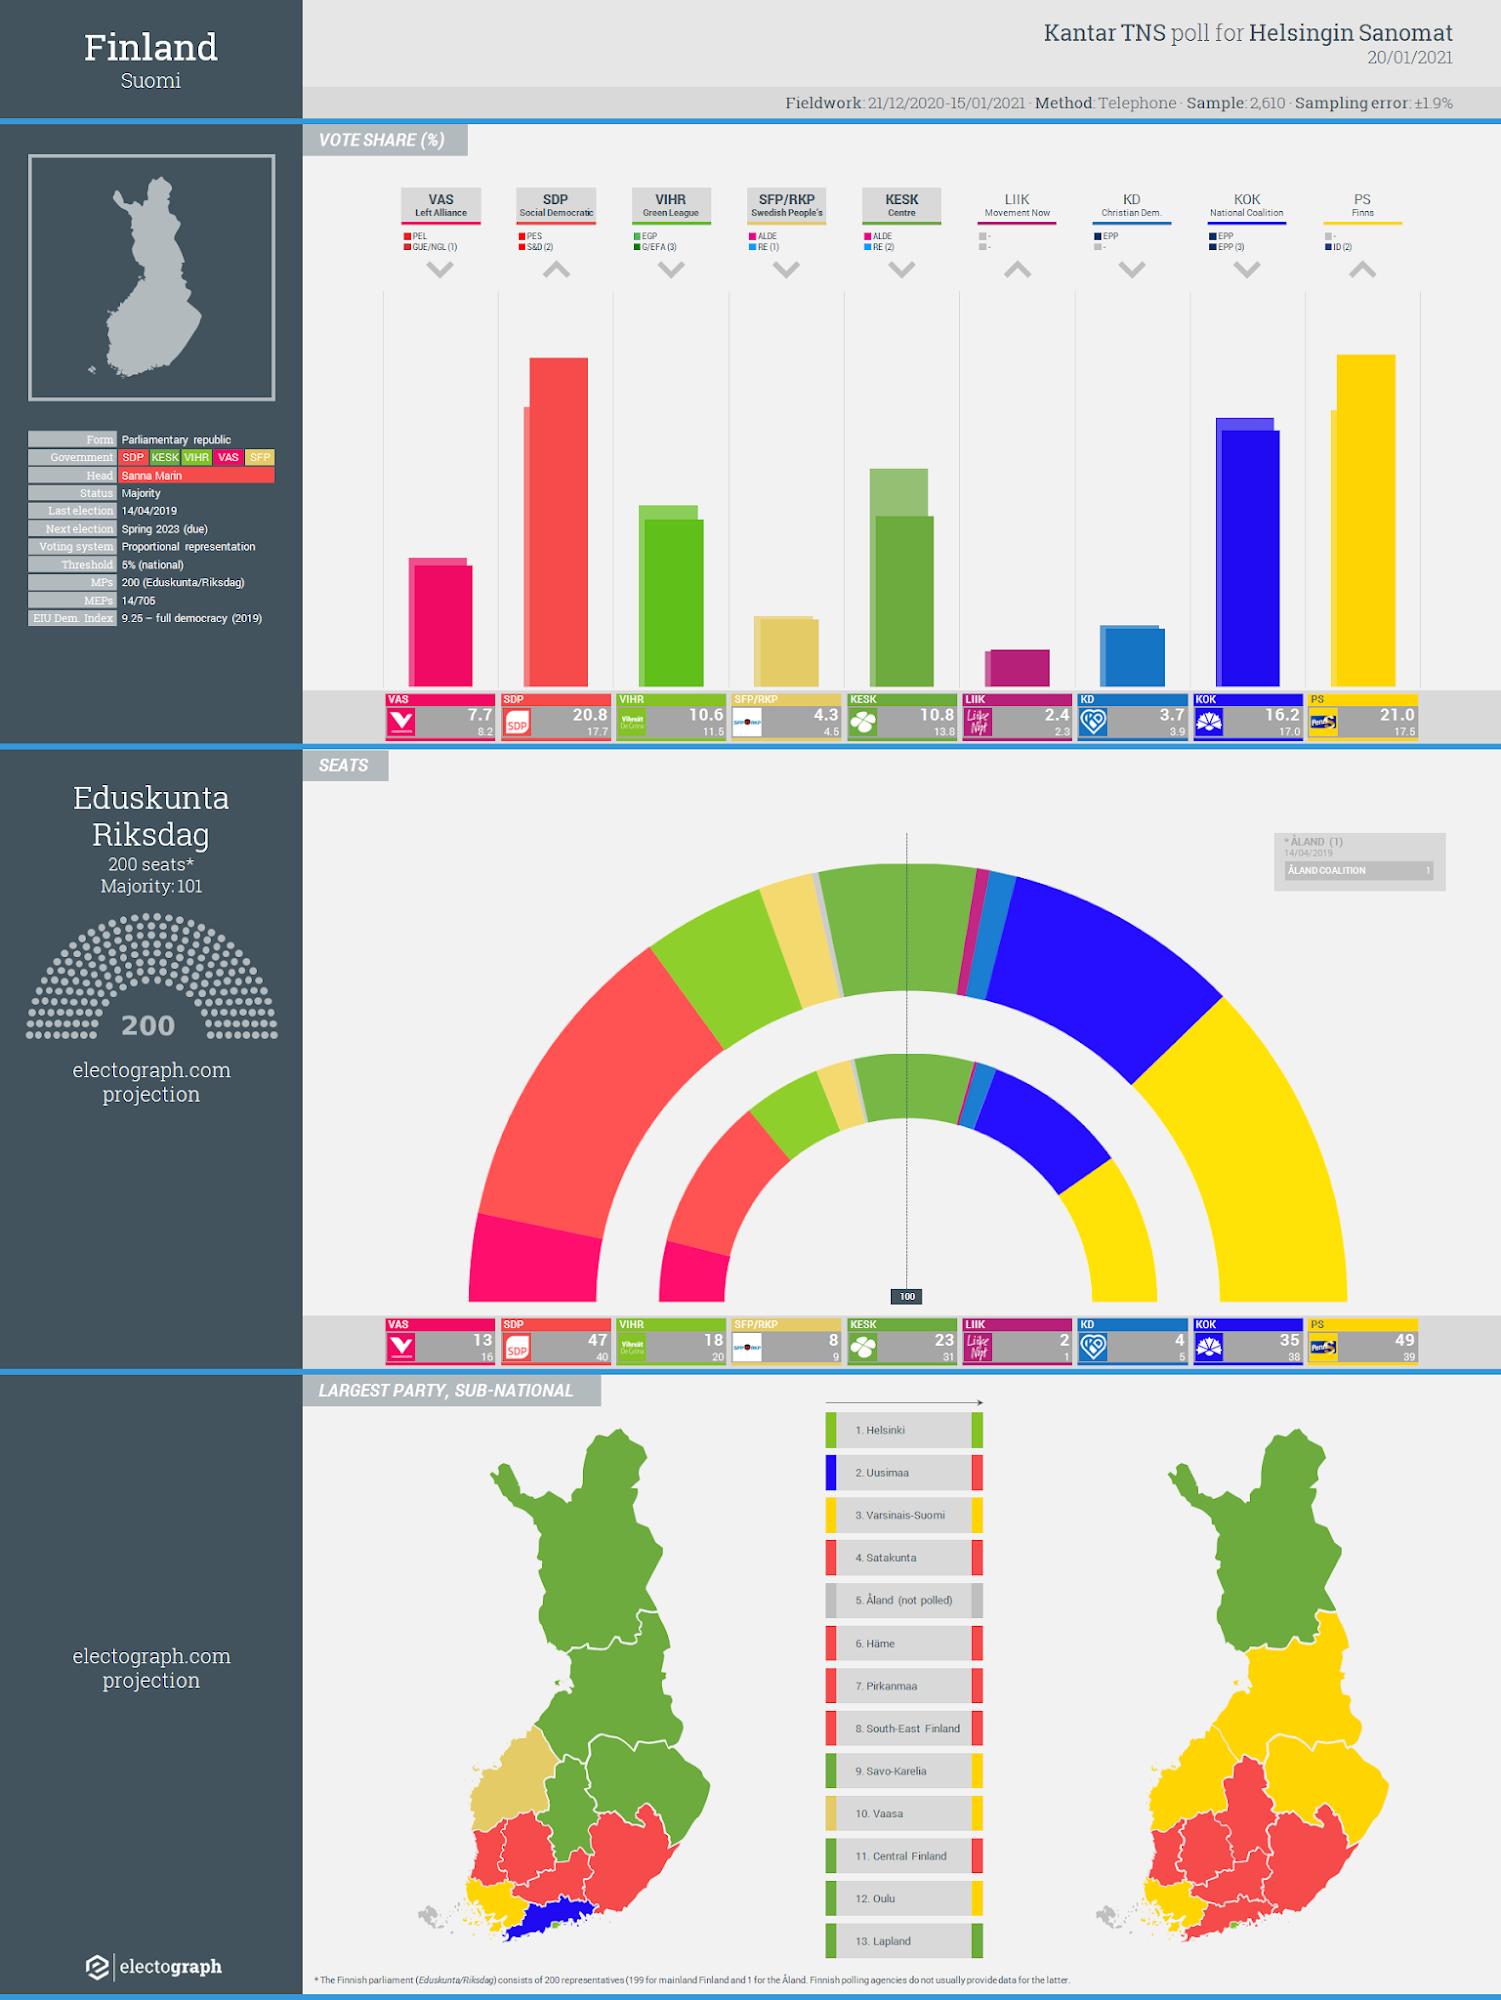 FINLAND: Kantar TNS poll chart for Helsingin Sanomat, 20 January 2021